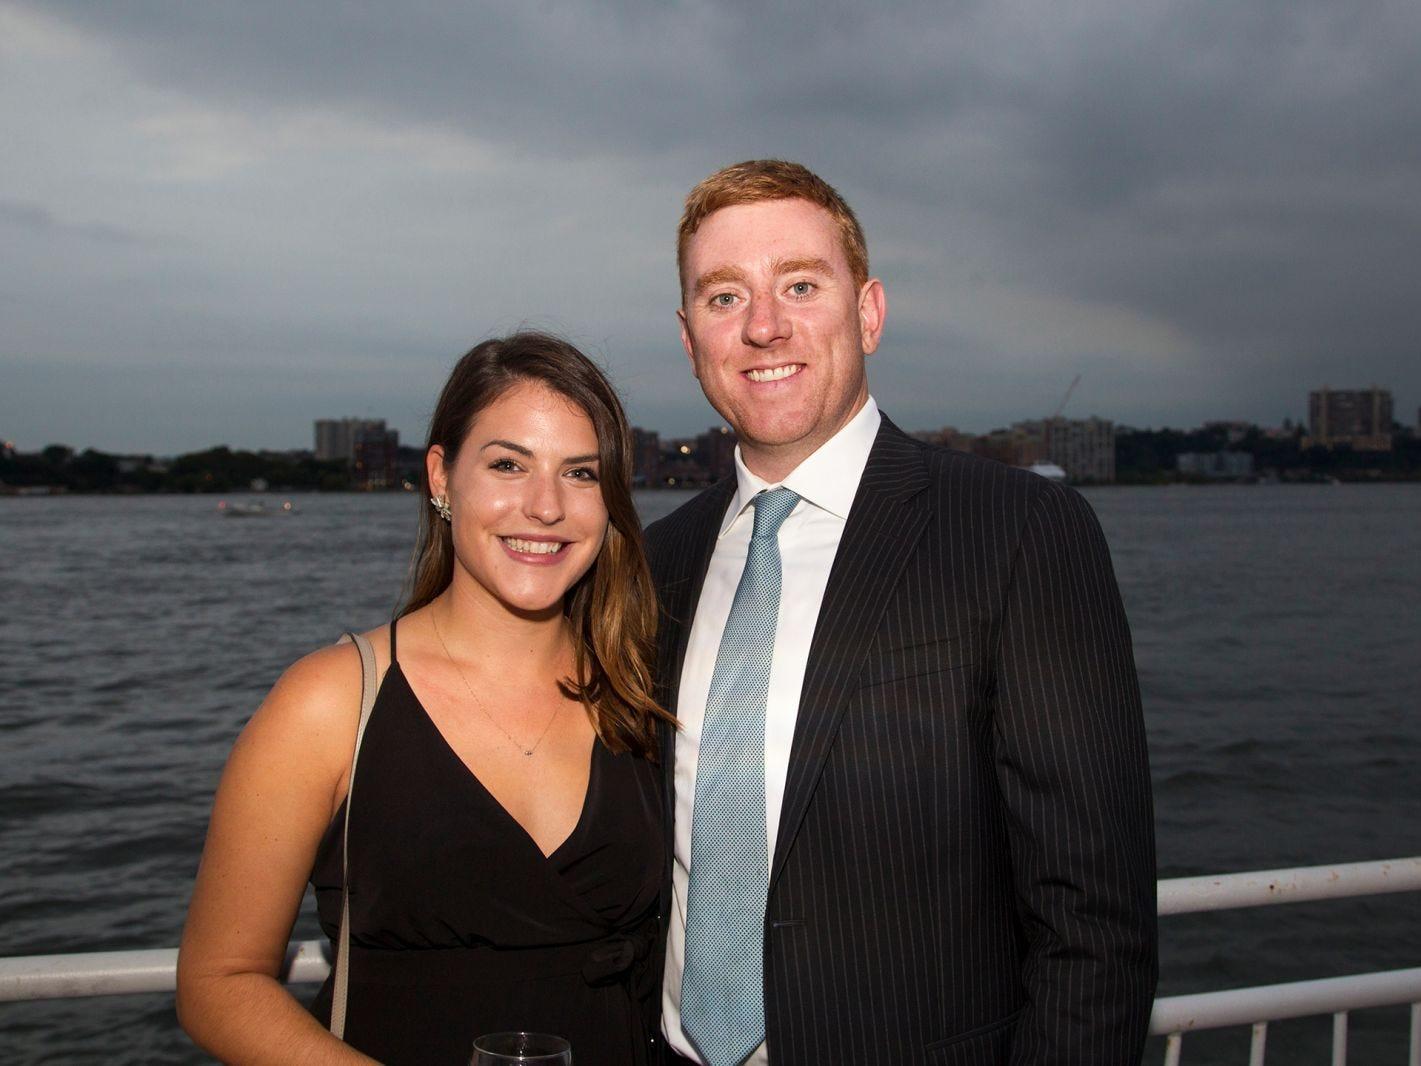 Katie Ferris, Ryan Paris. 11th annual IronMatt Fundraiser Gala at Pier 60 Chelsea Piers. 09/20/2018